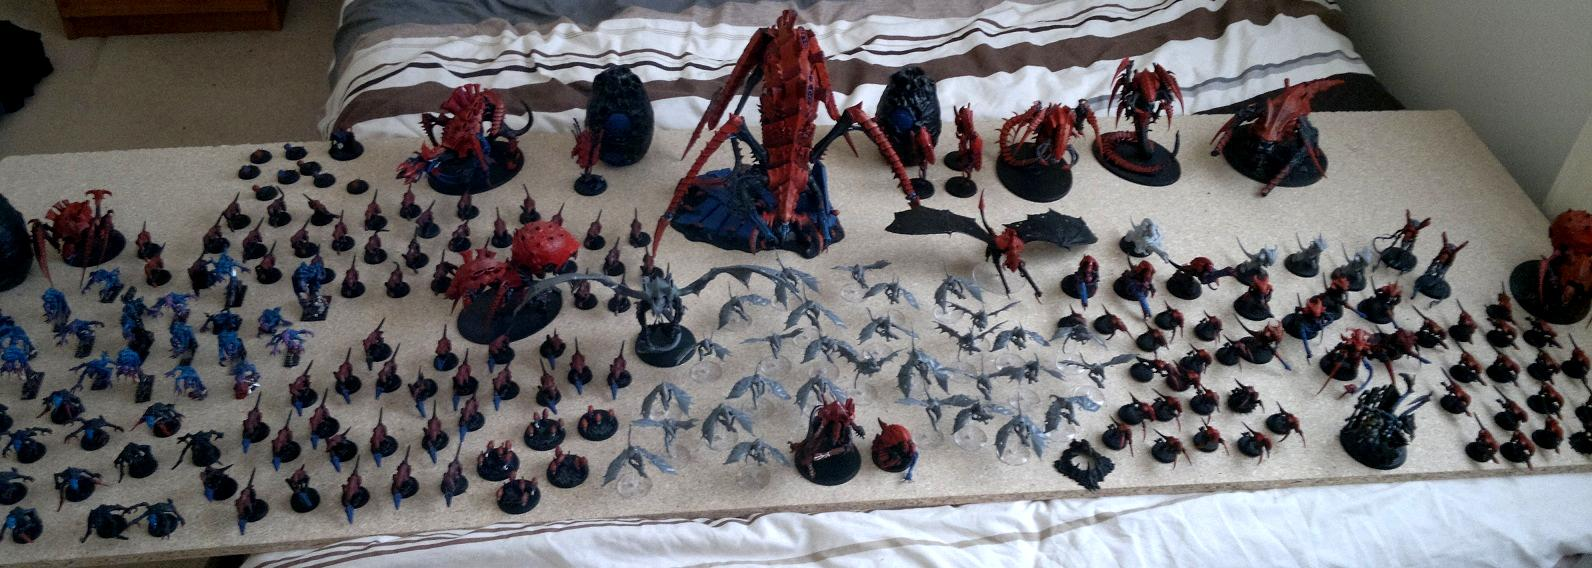 Apocalypse, Bugs, Nids, Tyranids